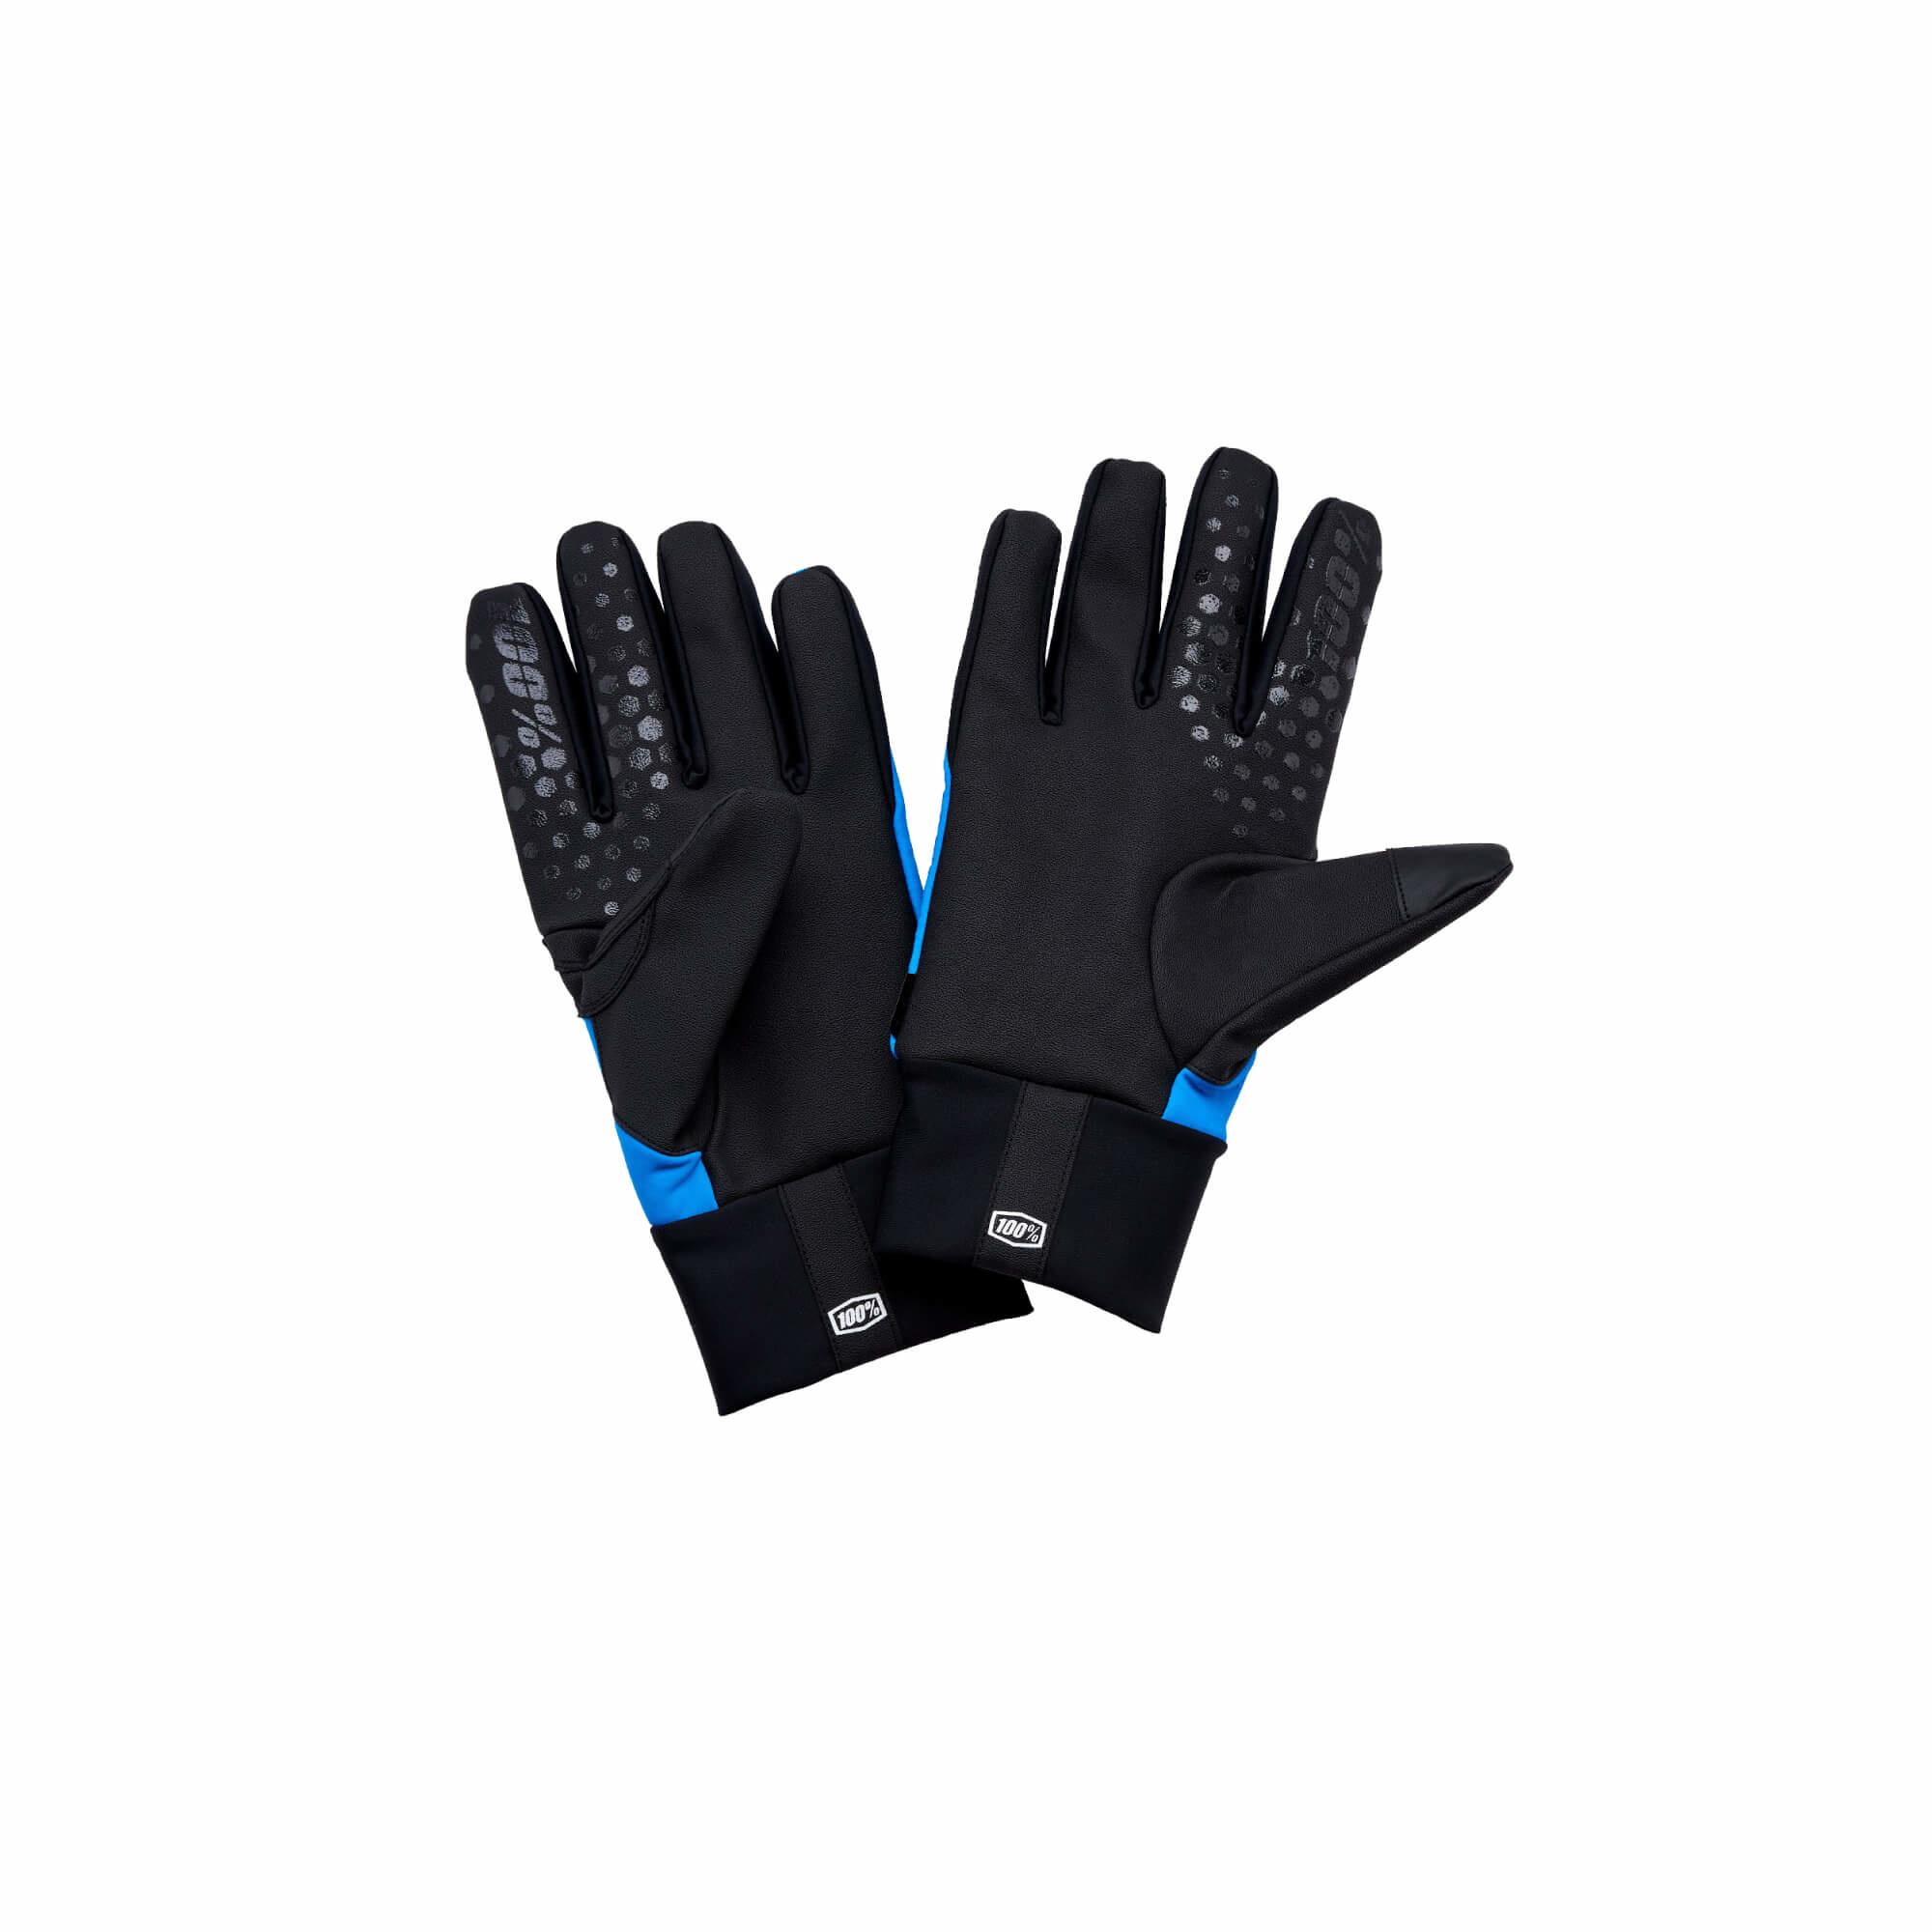 Hydromatic Waterproof Glove 2021-2